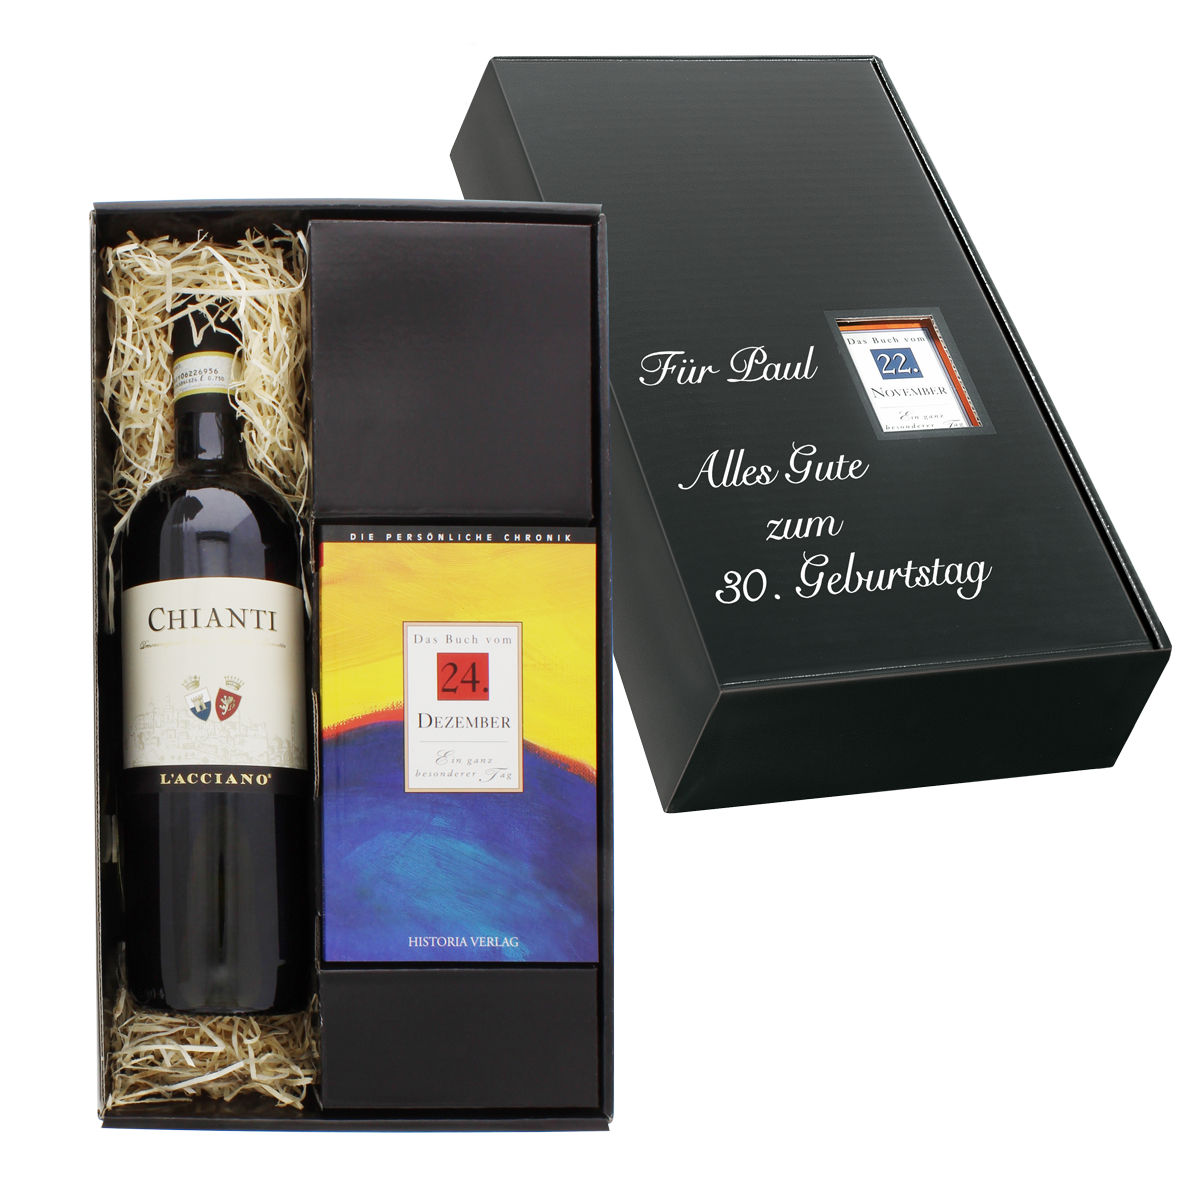 Italien-Set: Tageschronik vom 11. Januar & Chianti-Wein